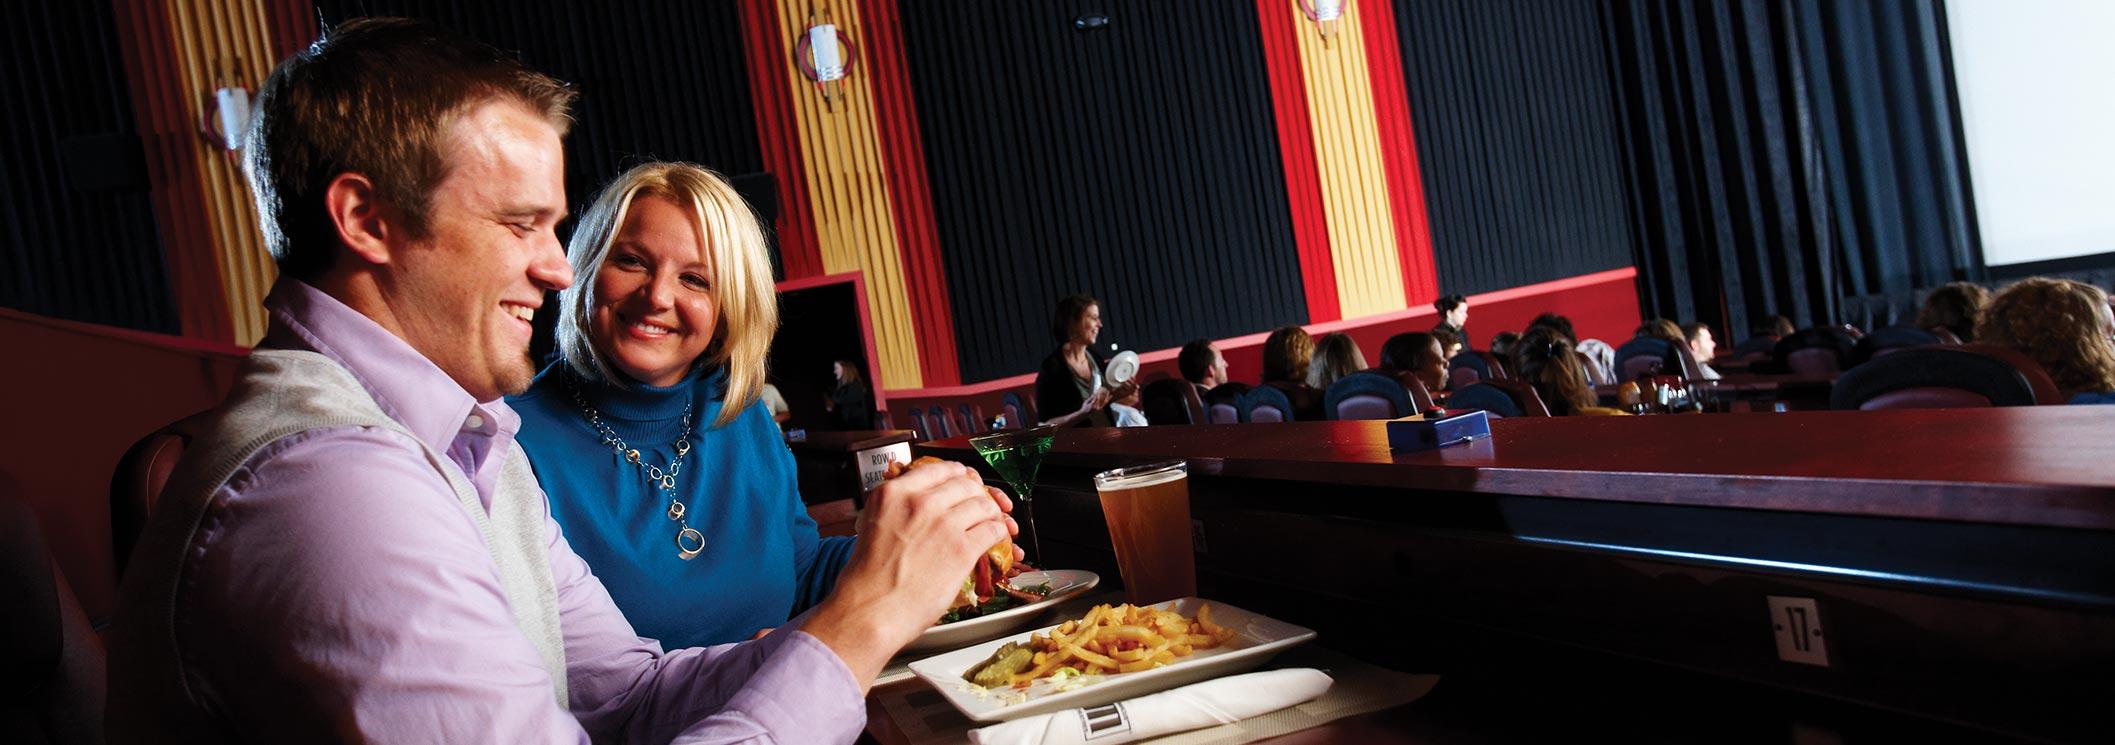 CineDine - In Theatre Dining